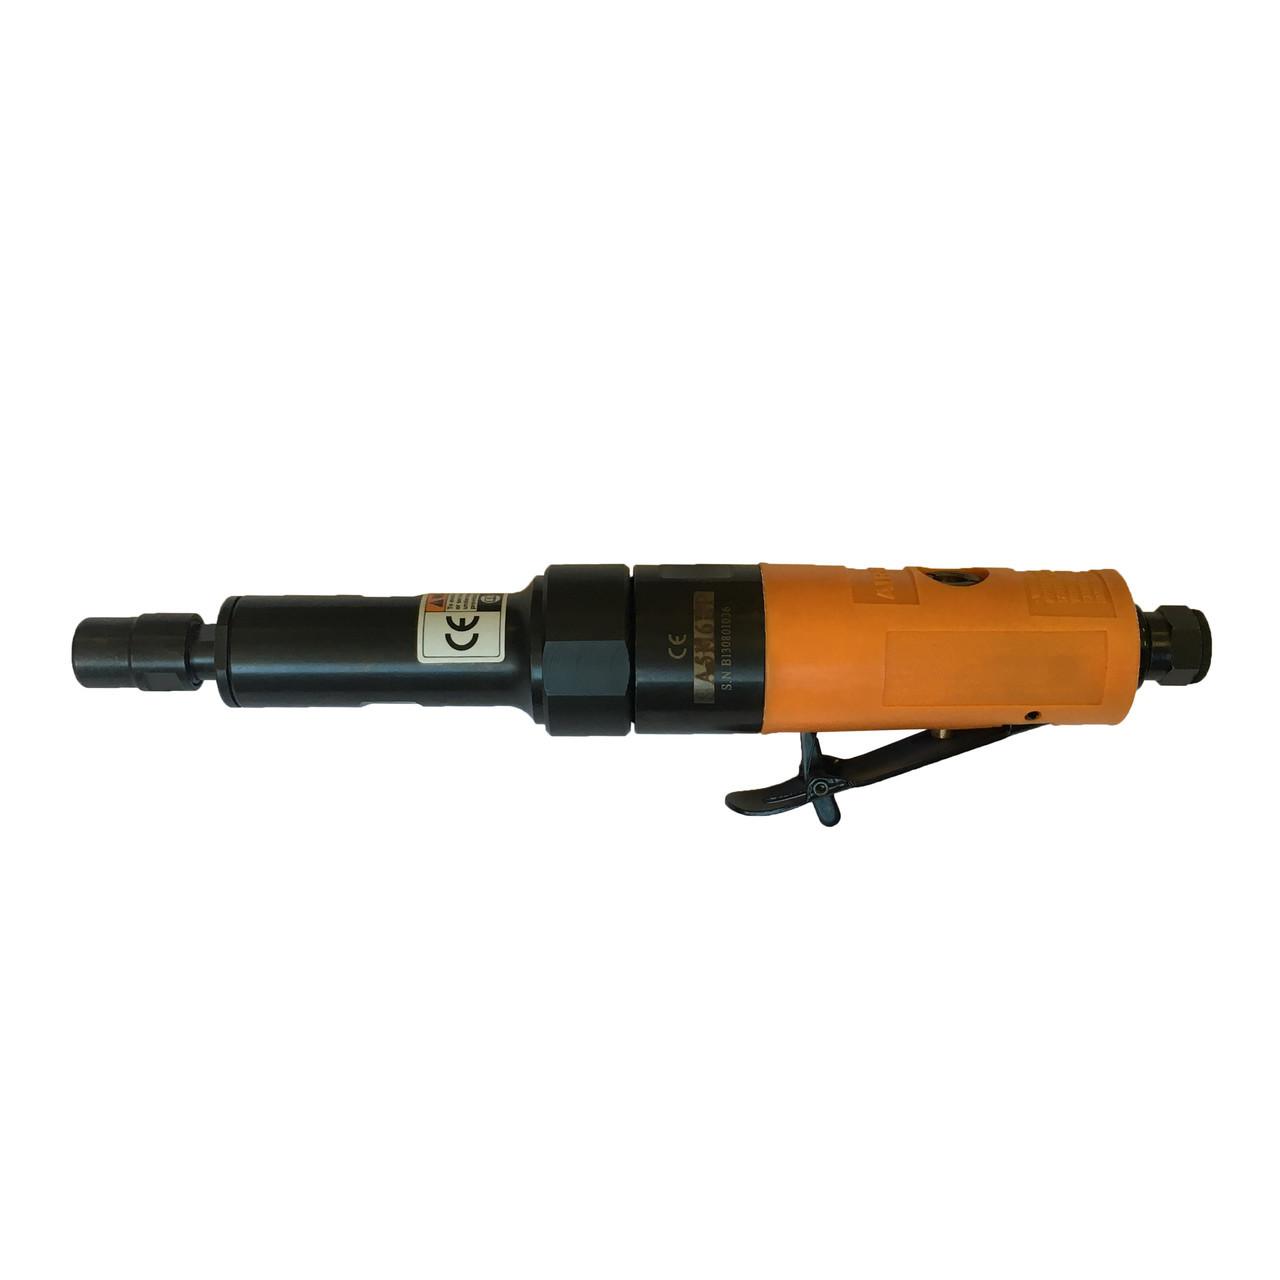 Гриндер прямой пневматический VGL SA5116LP (Тайвань)